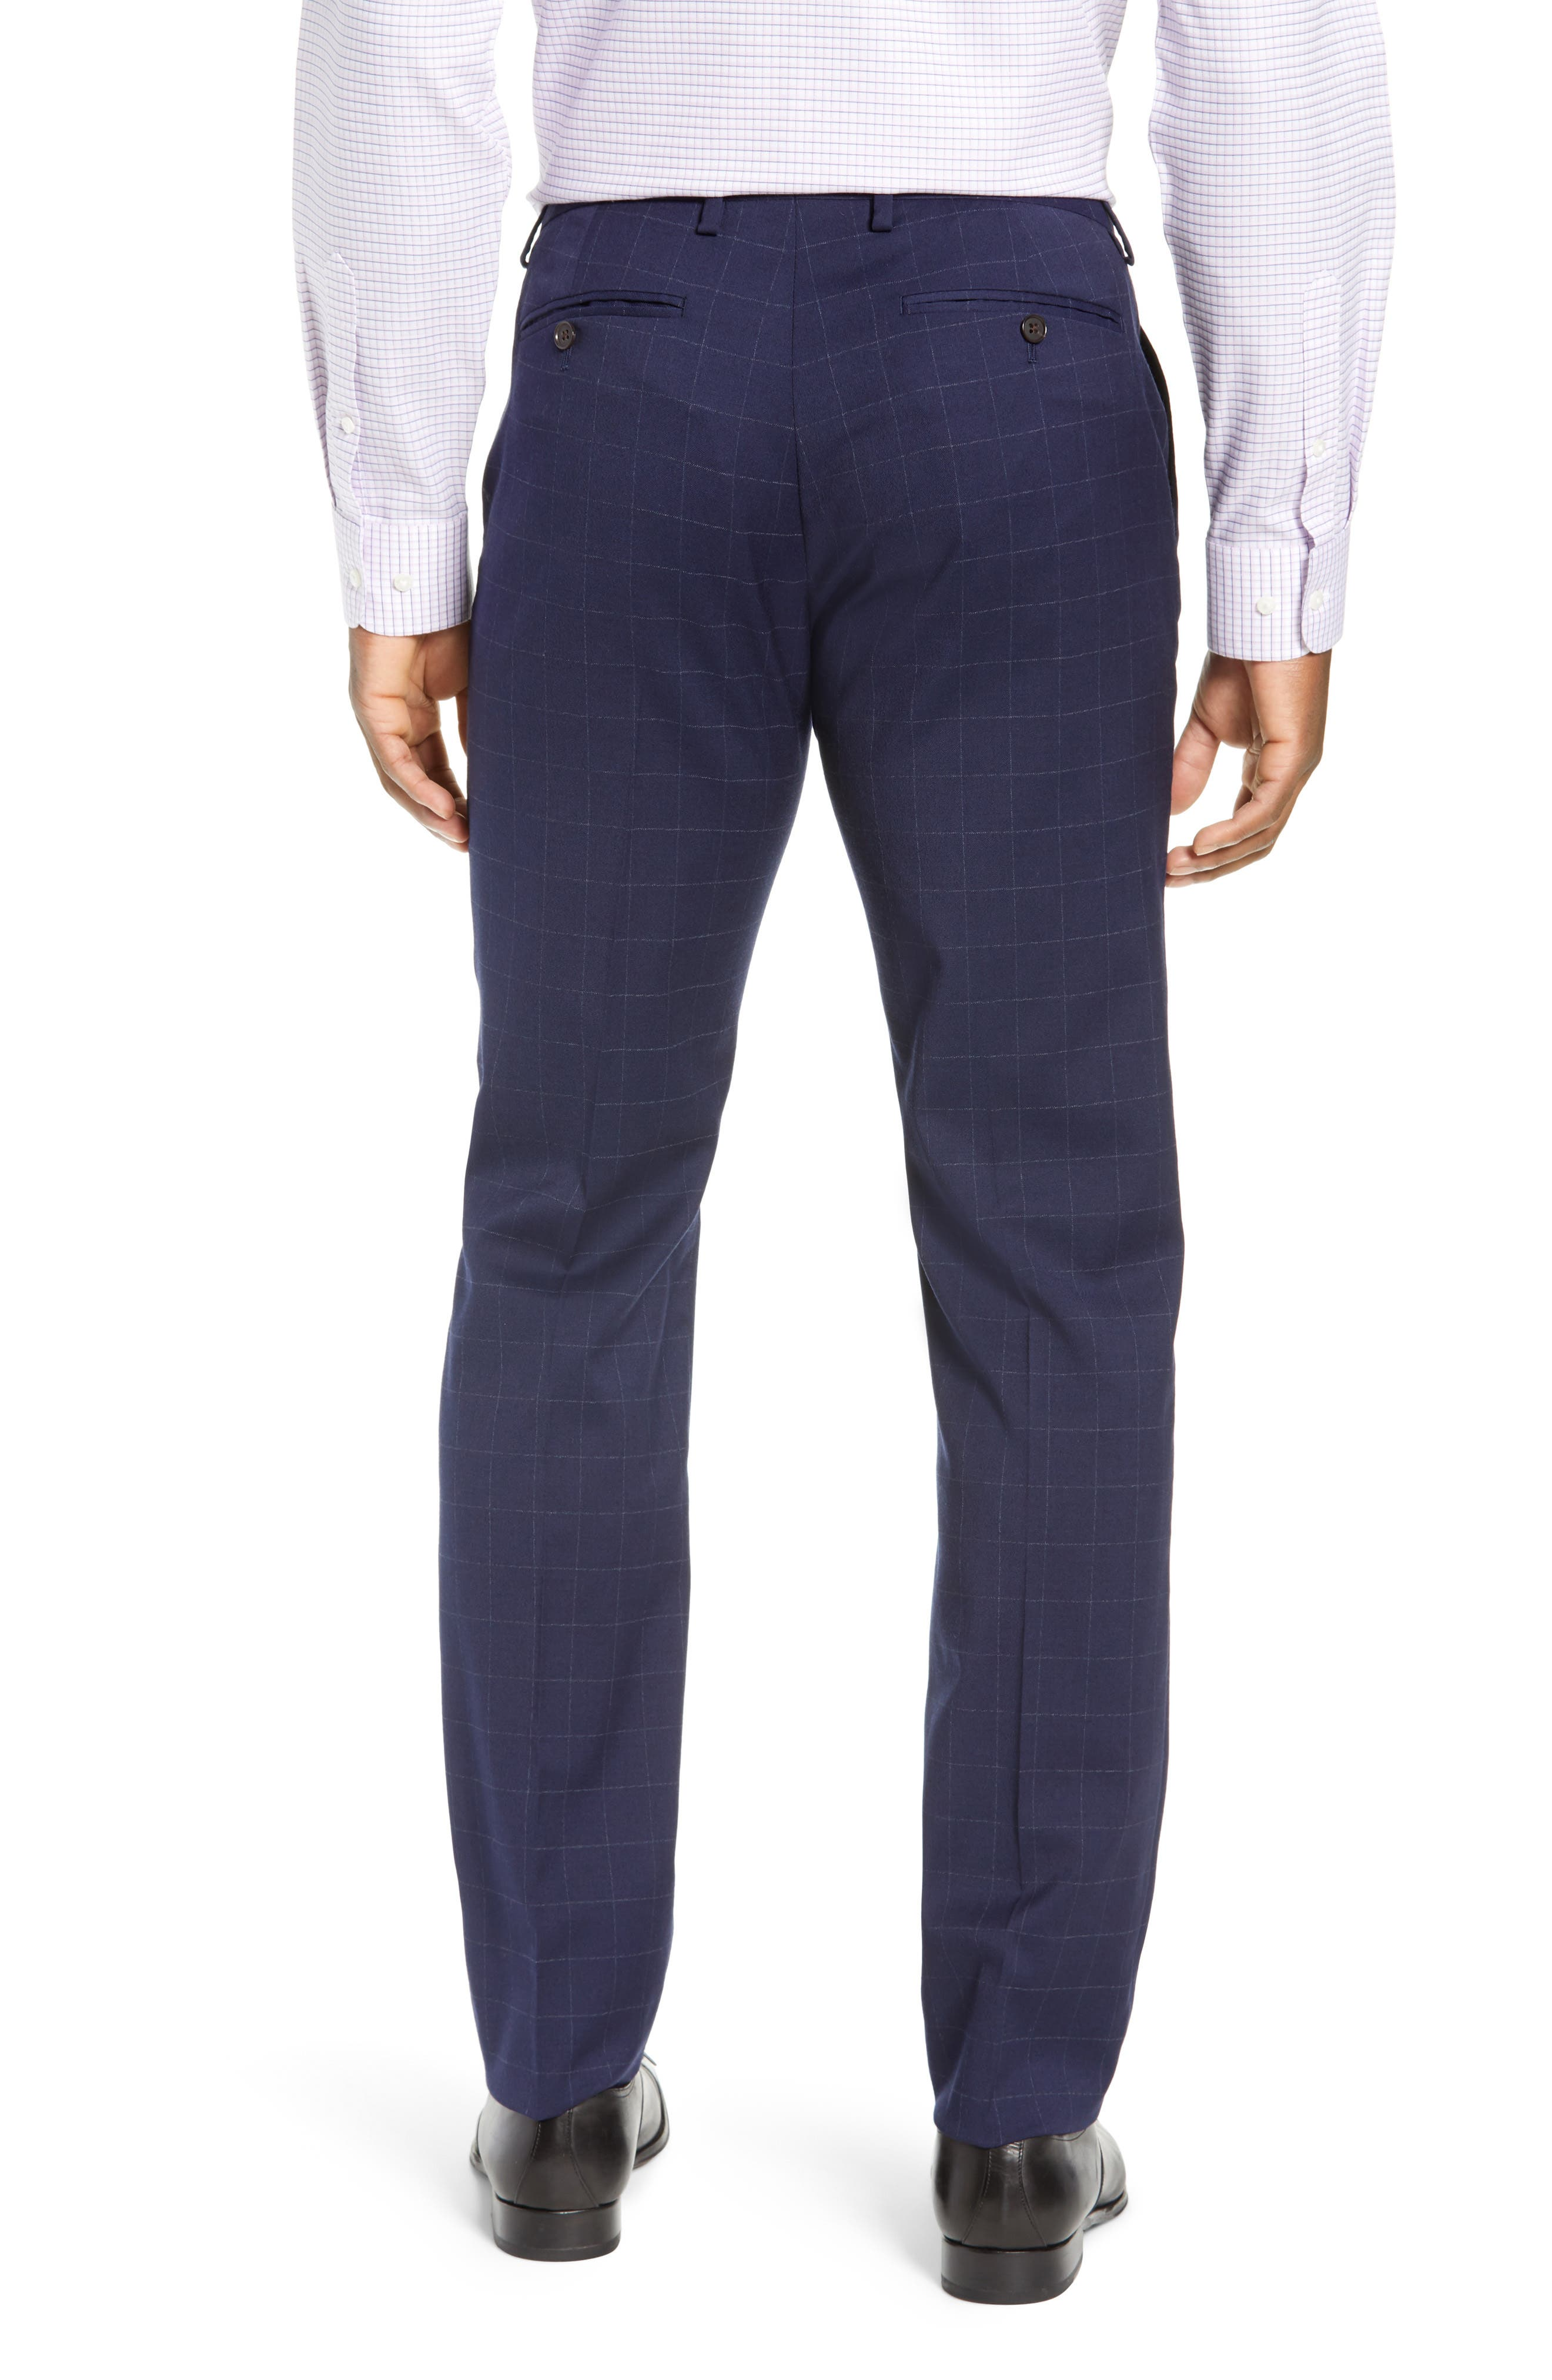 BONOBOS, Jetsetter Slim Fit Stretch Suit Pants, Alternate thumbnail 2, color, NAVY CHALK WINDOWPANE